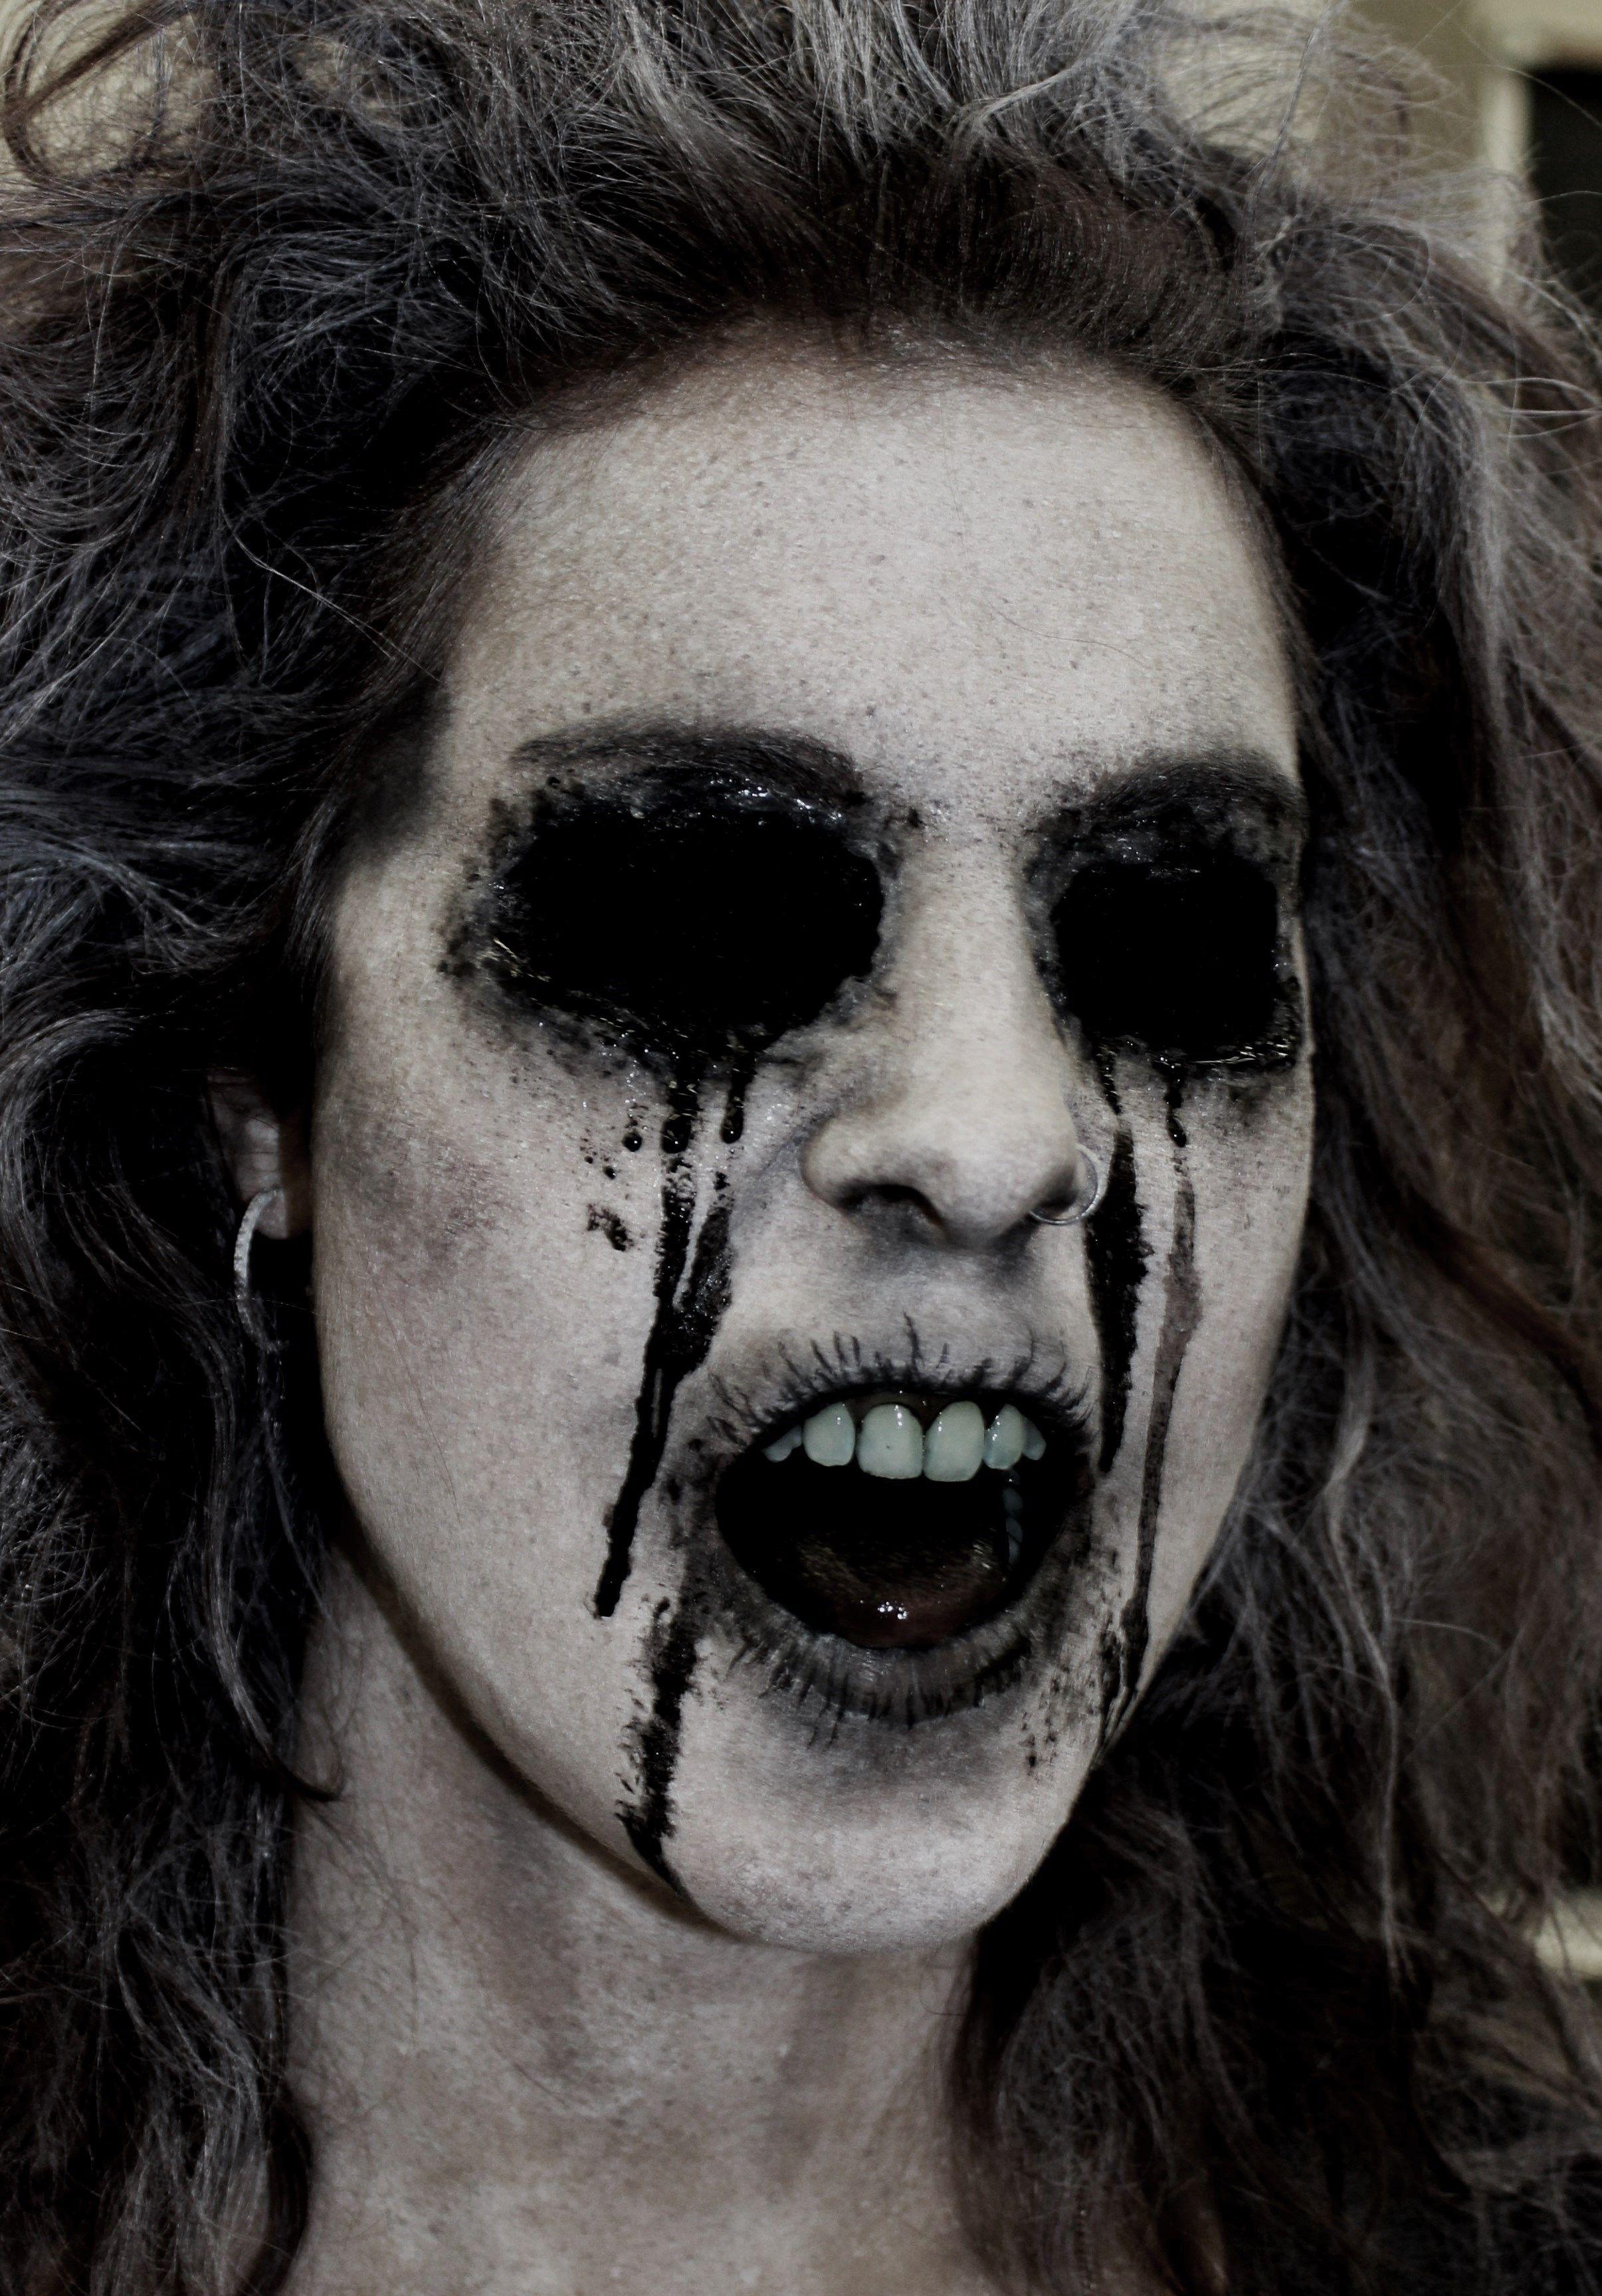 Demo Makeup by Rhonda Causton(Reel Twisted FX) / The mekeup effect ...